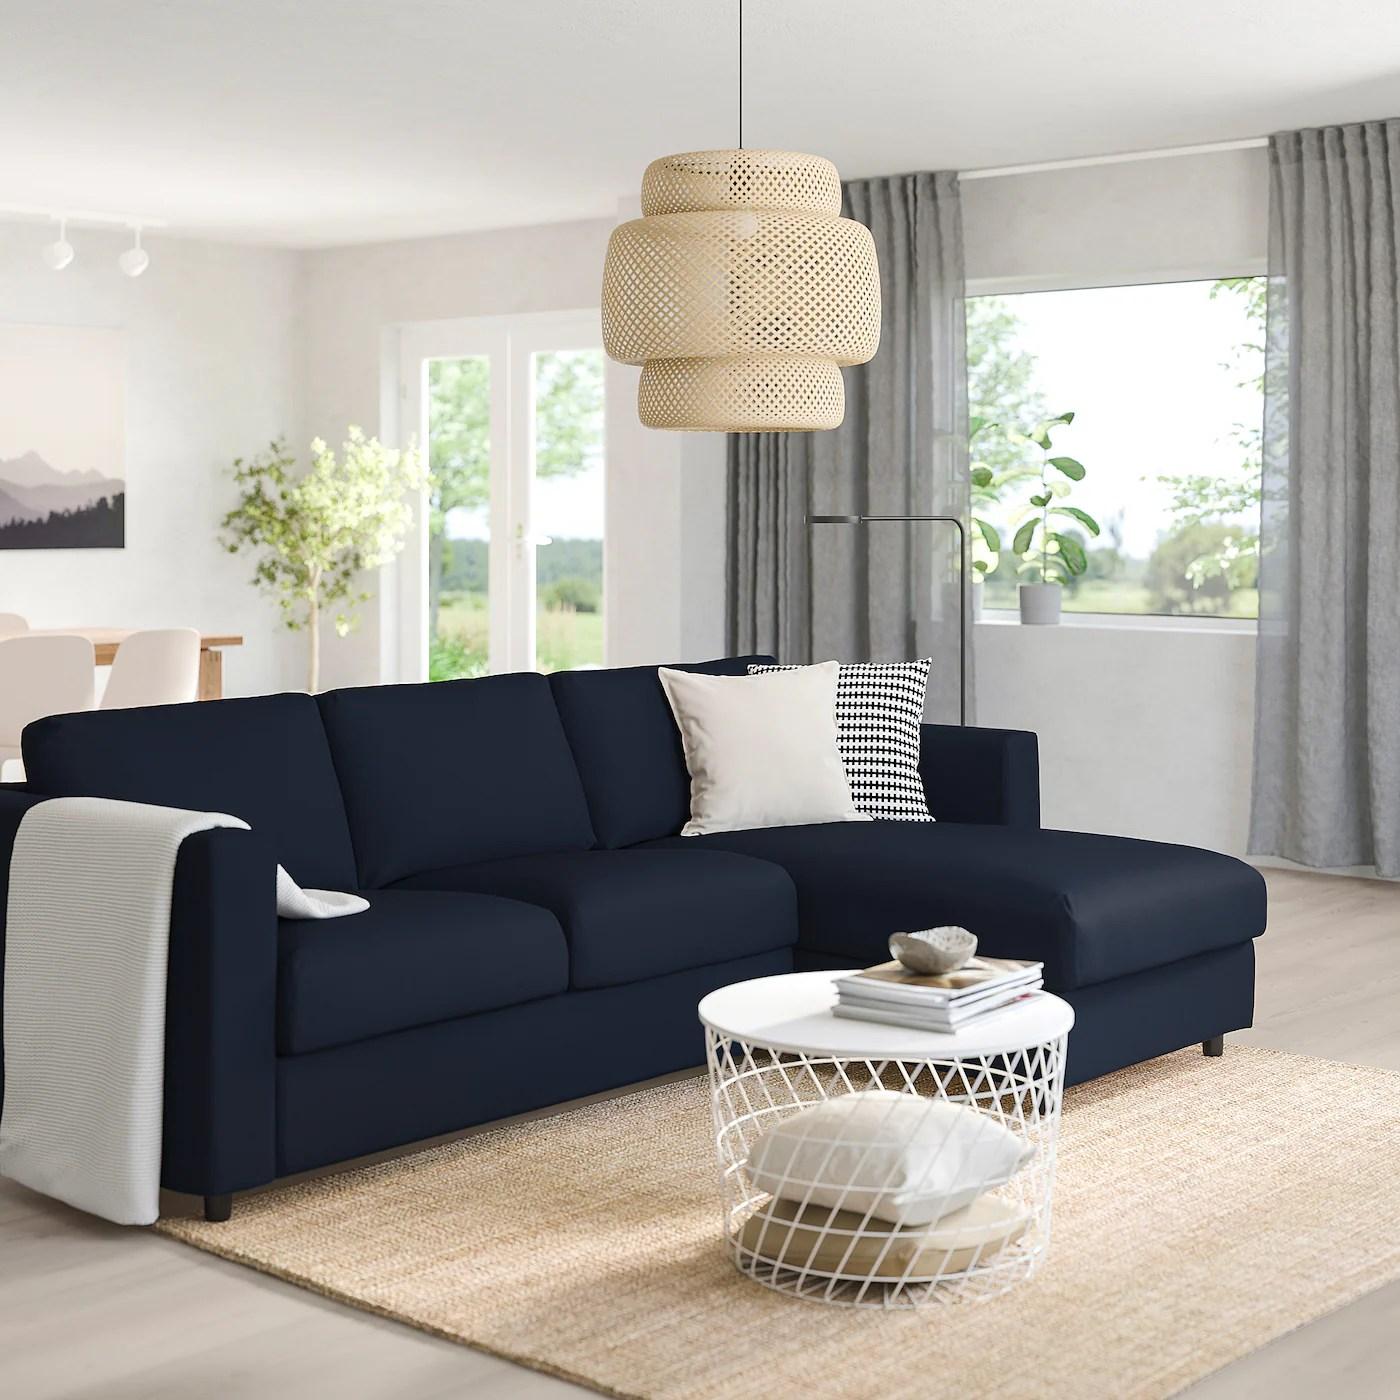 vimle 3 seat sofa with chaise longue grasbo black blue